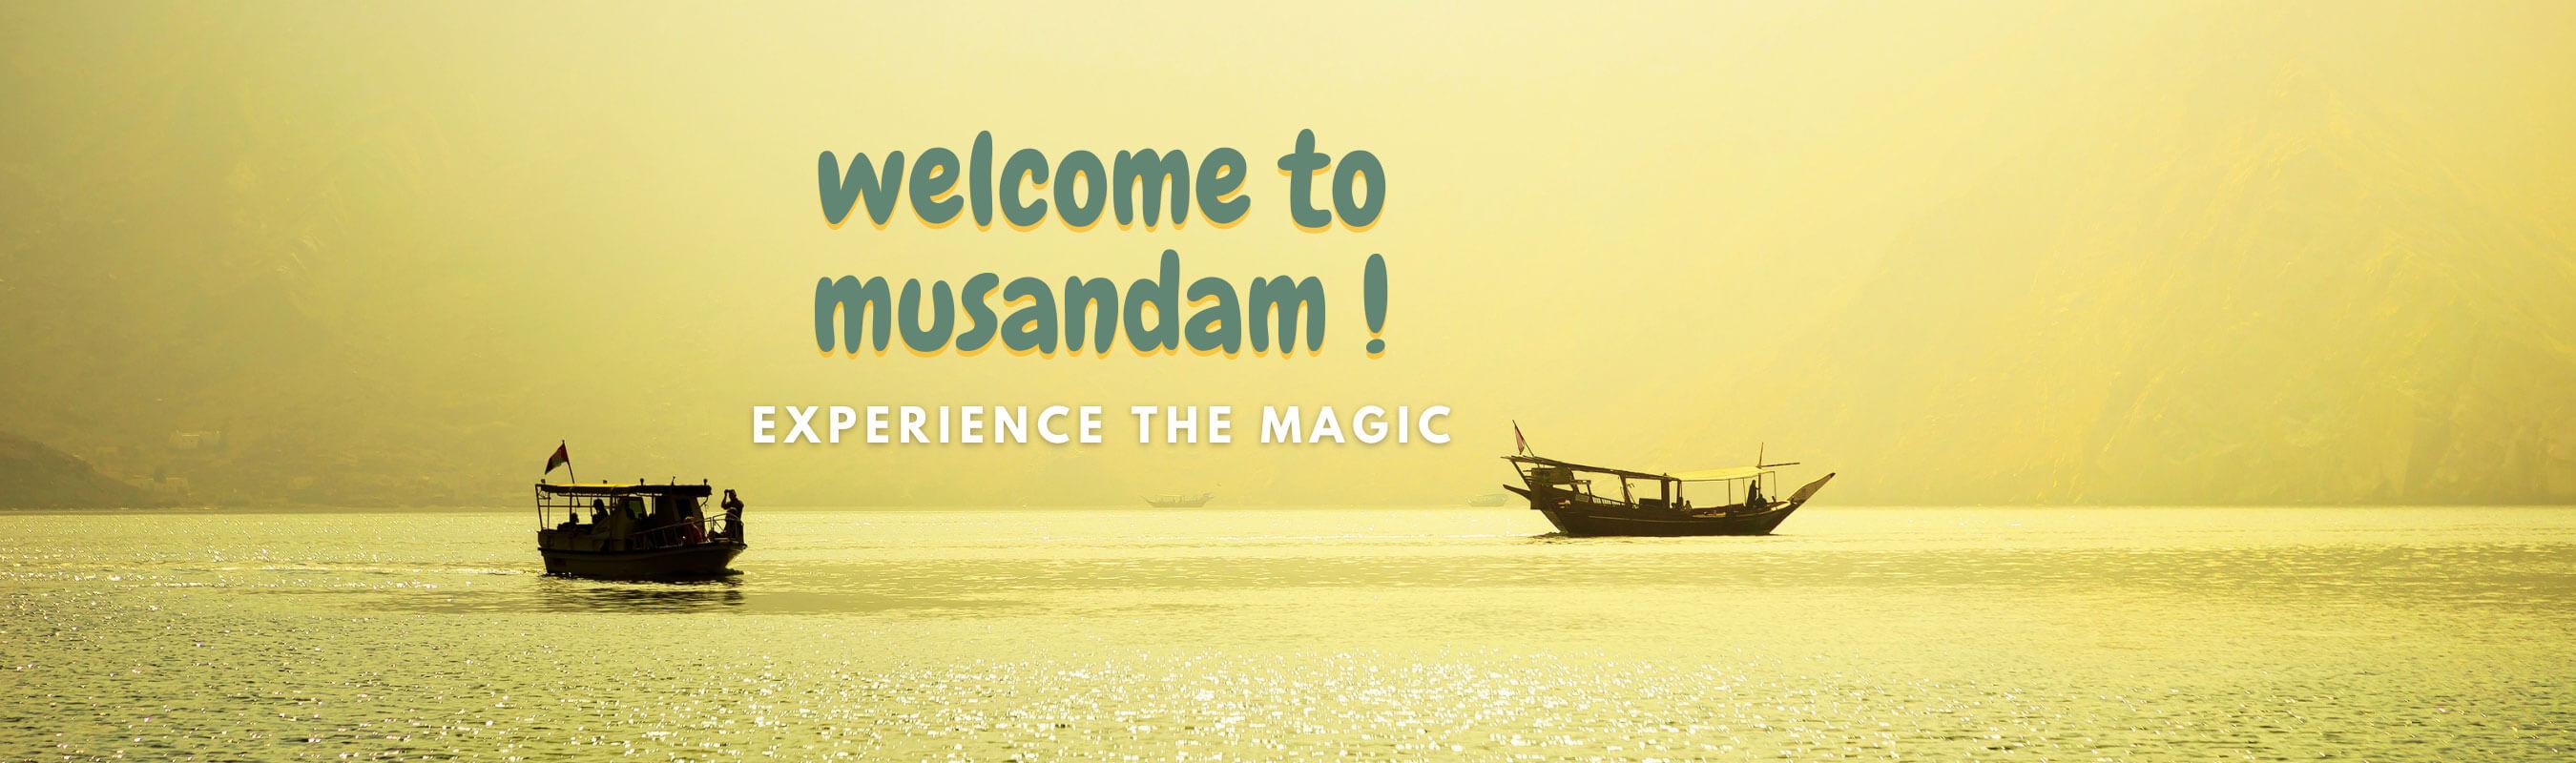 Musandam